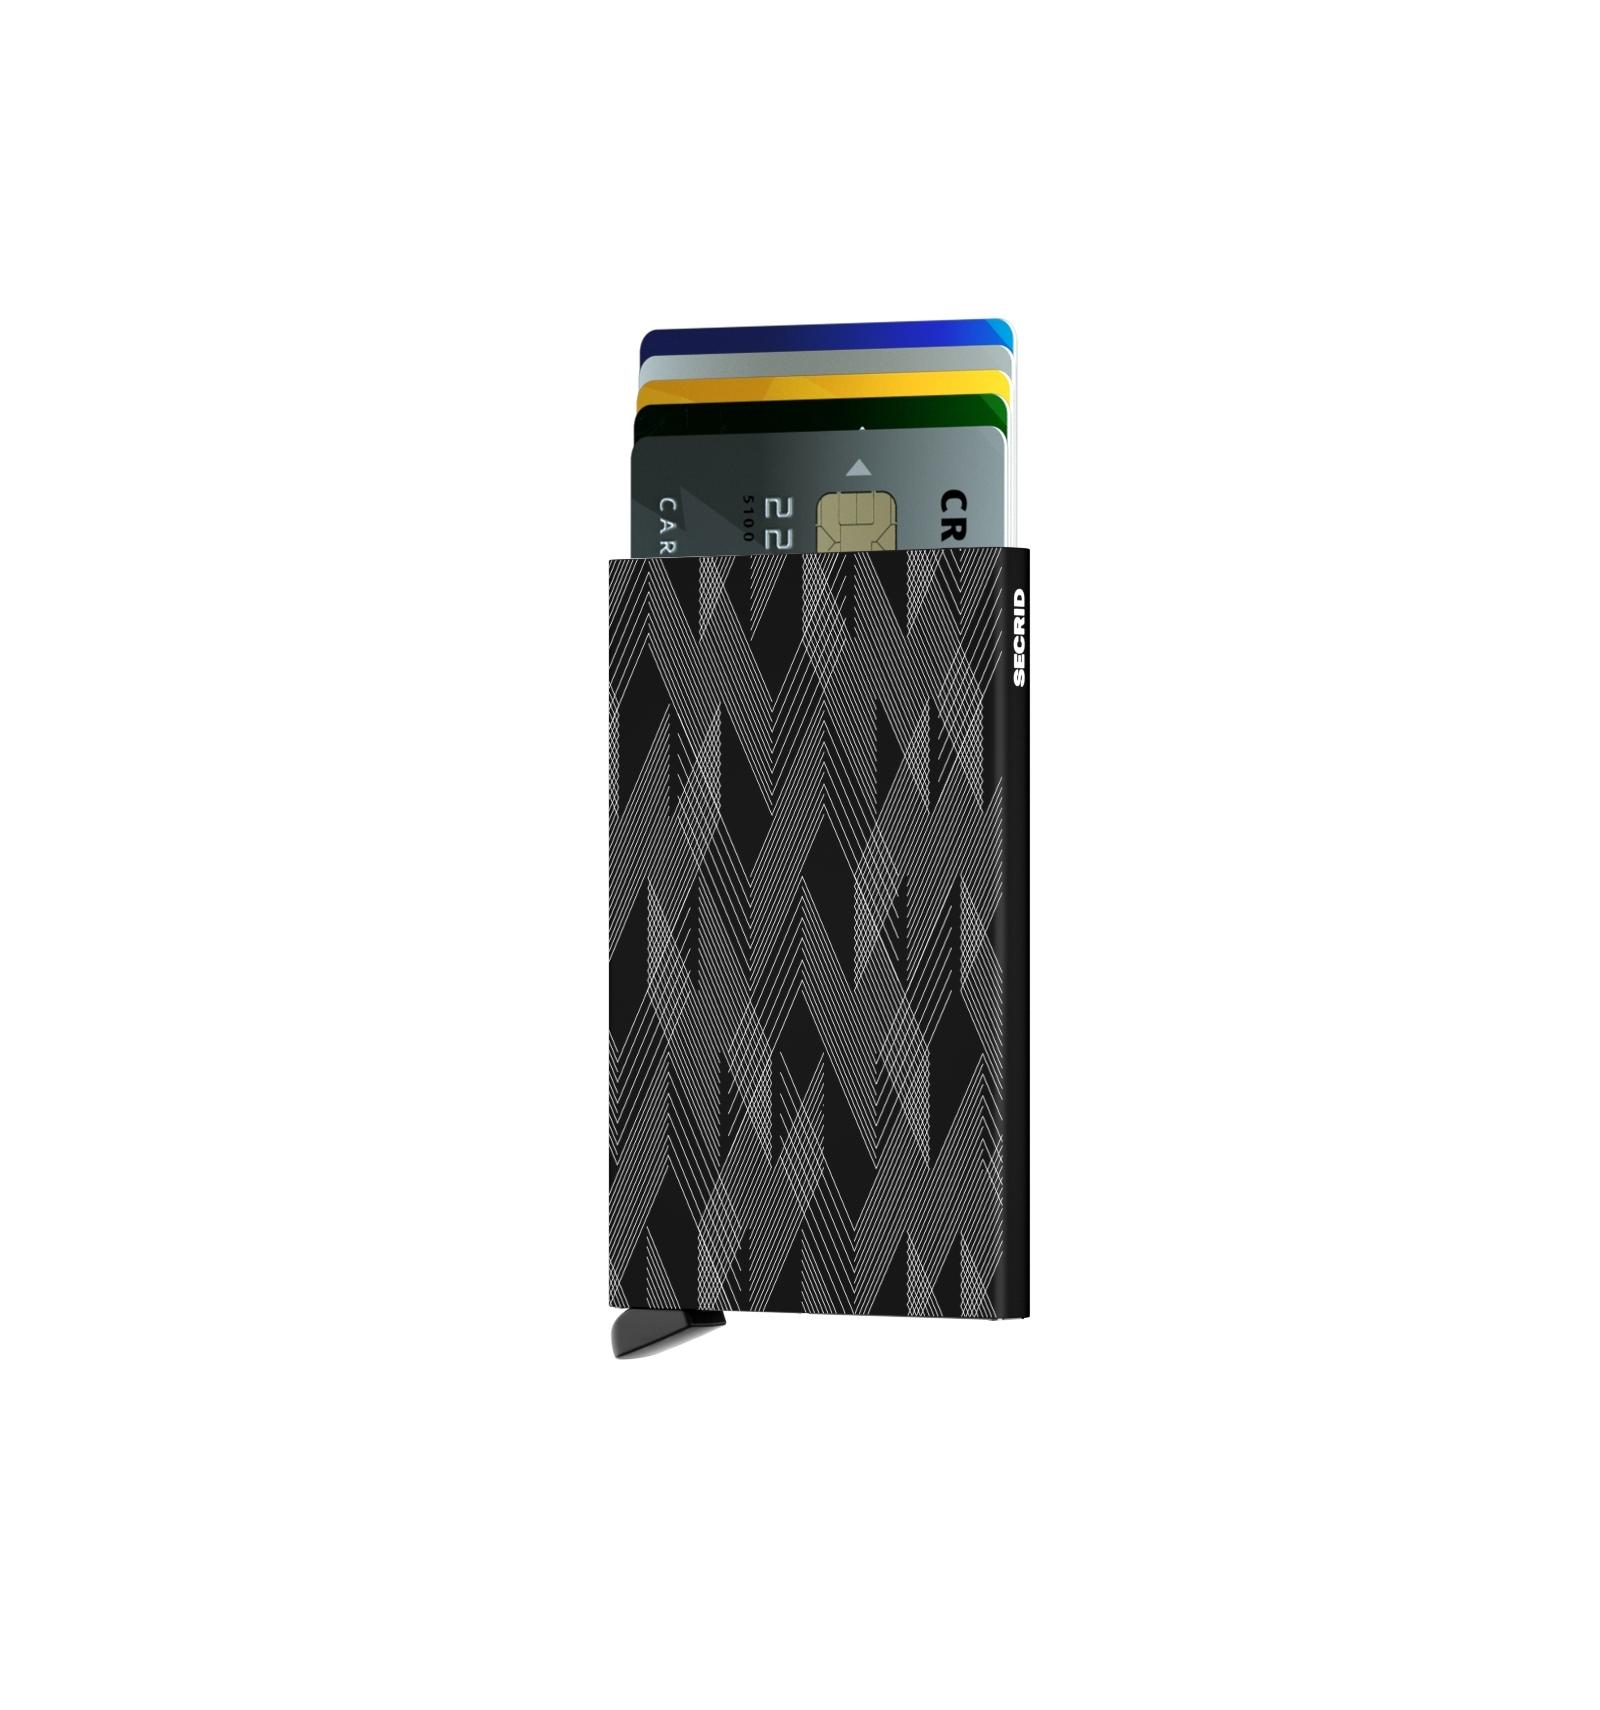 https://osez-sophie.com/4348-thickbox_default/porte-carte-cardprotector-secrid-aluminium-noir-gravure-laser-zigzag-osez-sophie.jpg